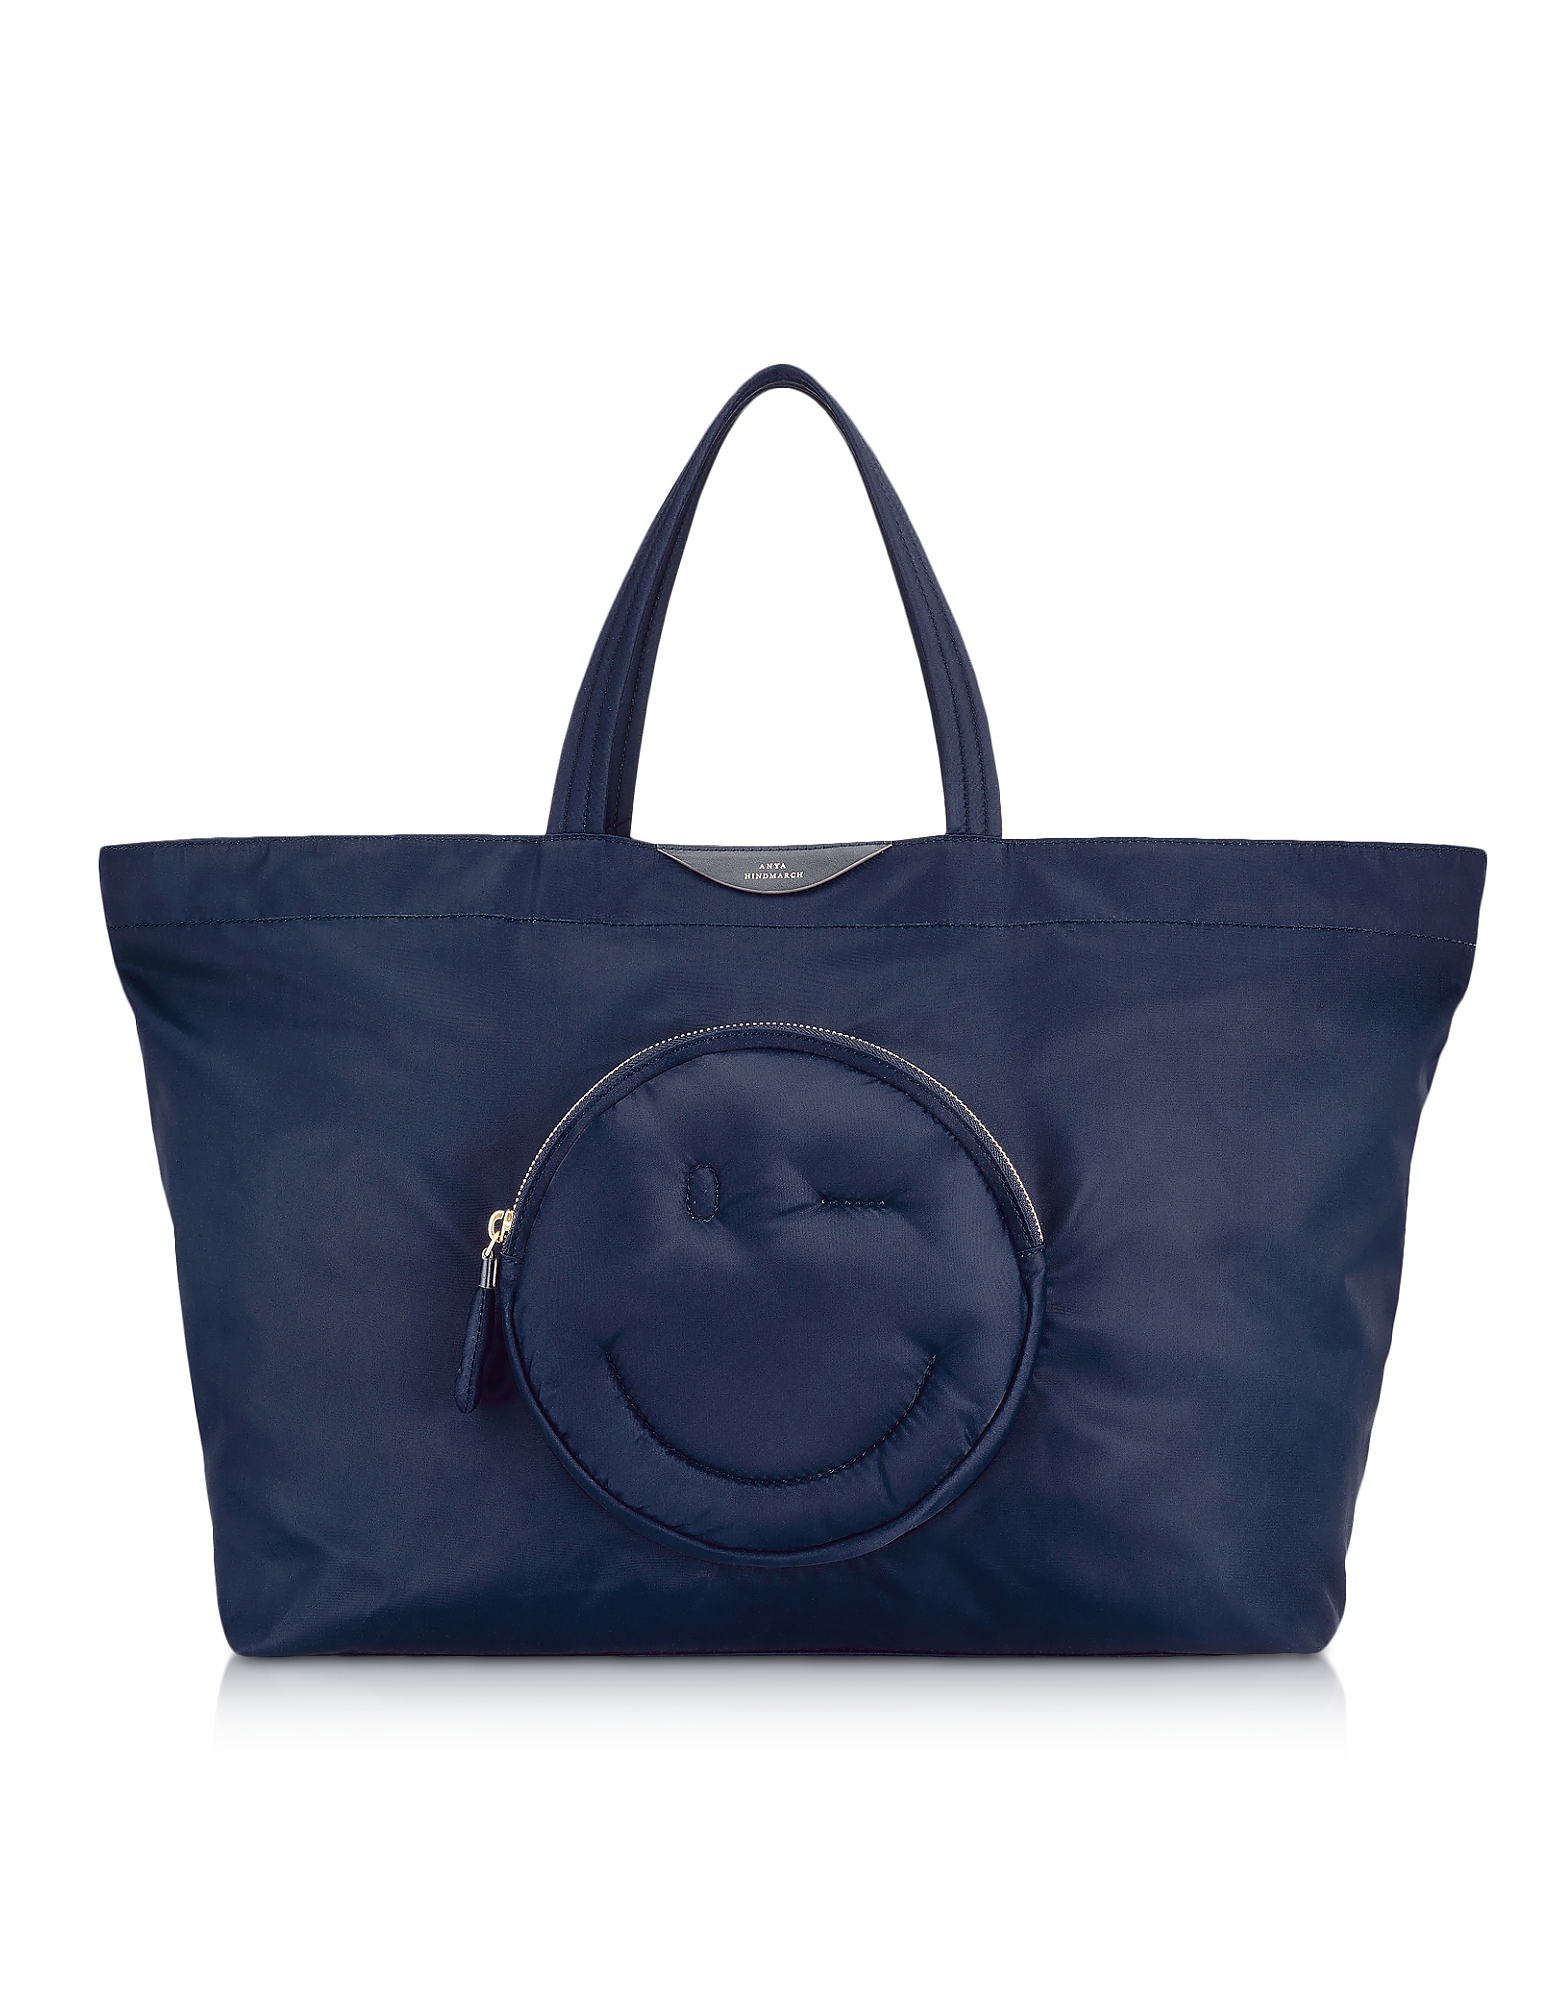 Image of Anya Hindmarch Designer Handbags, Navy Blue Nylon Large Chubby Smiley E/W Tote Bag